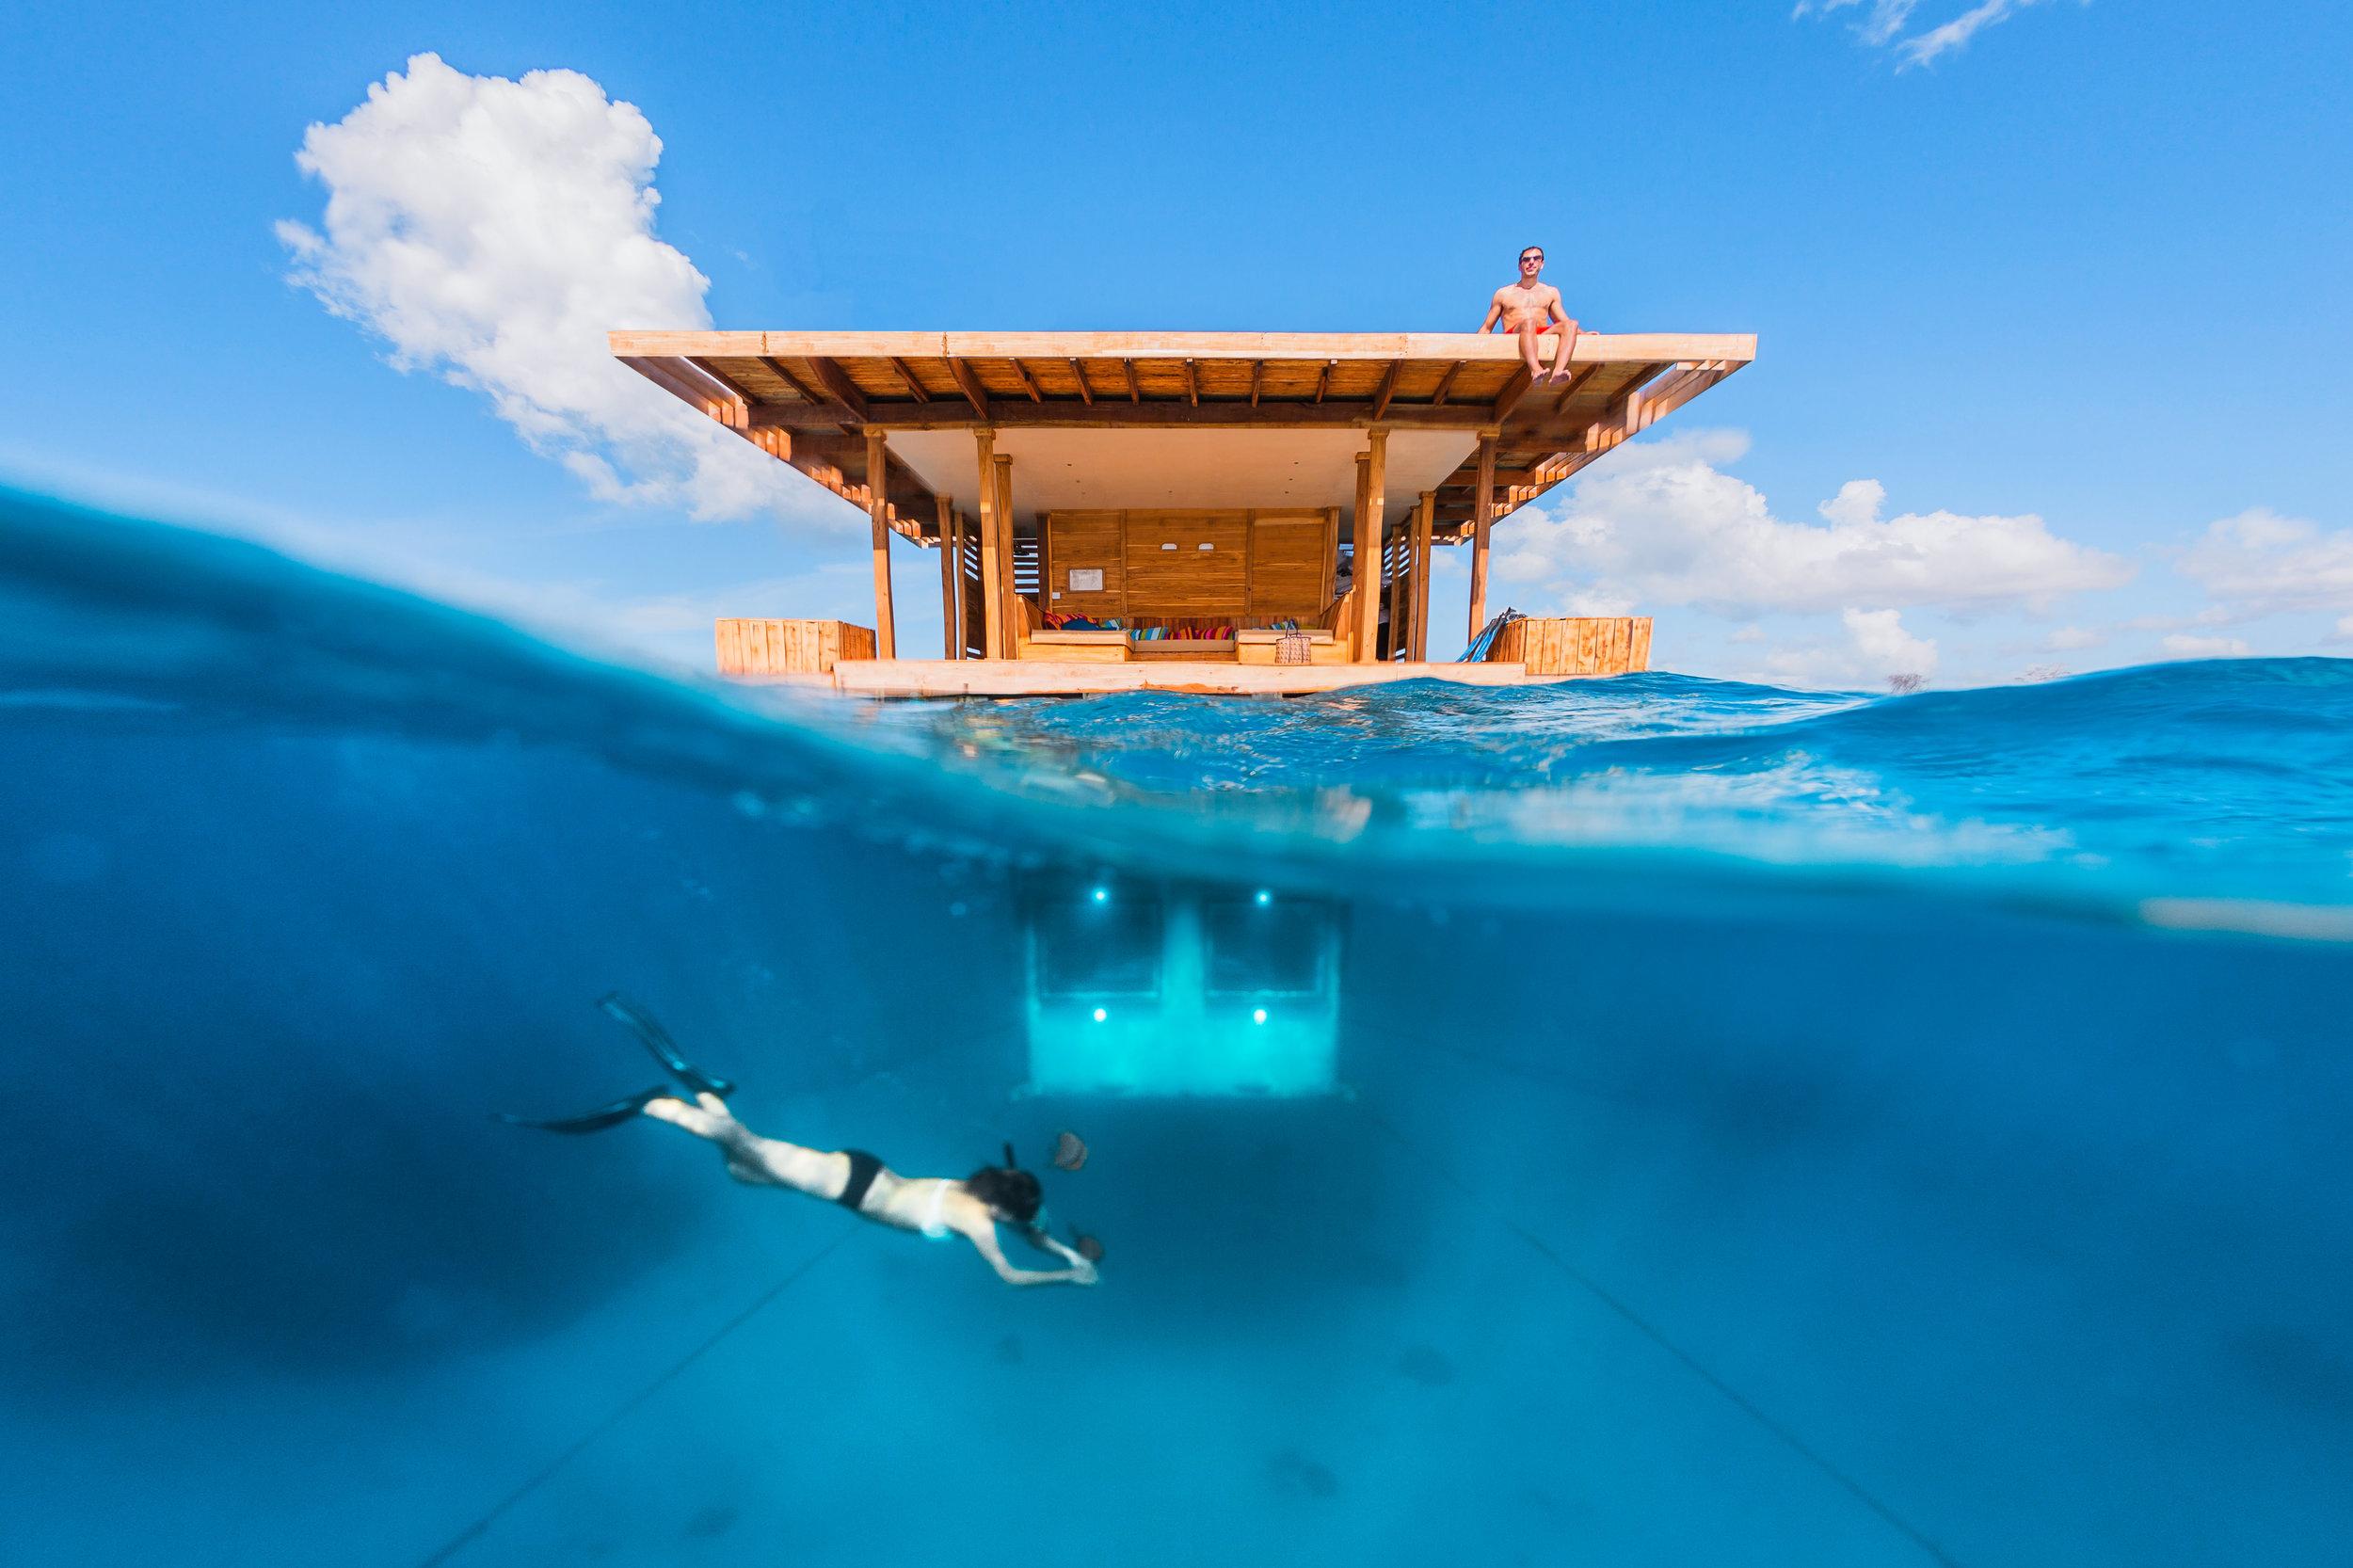 Photo property of the Manta Resort